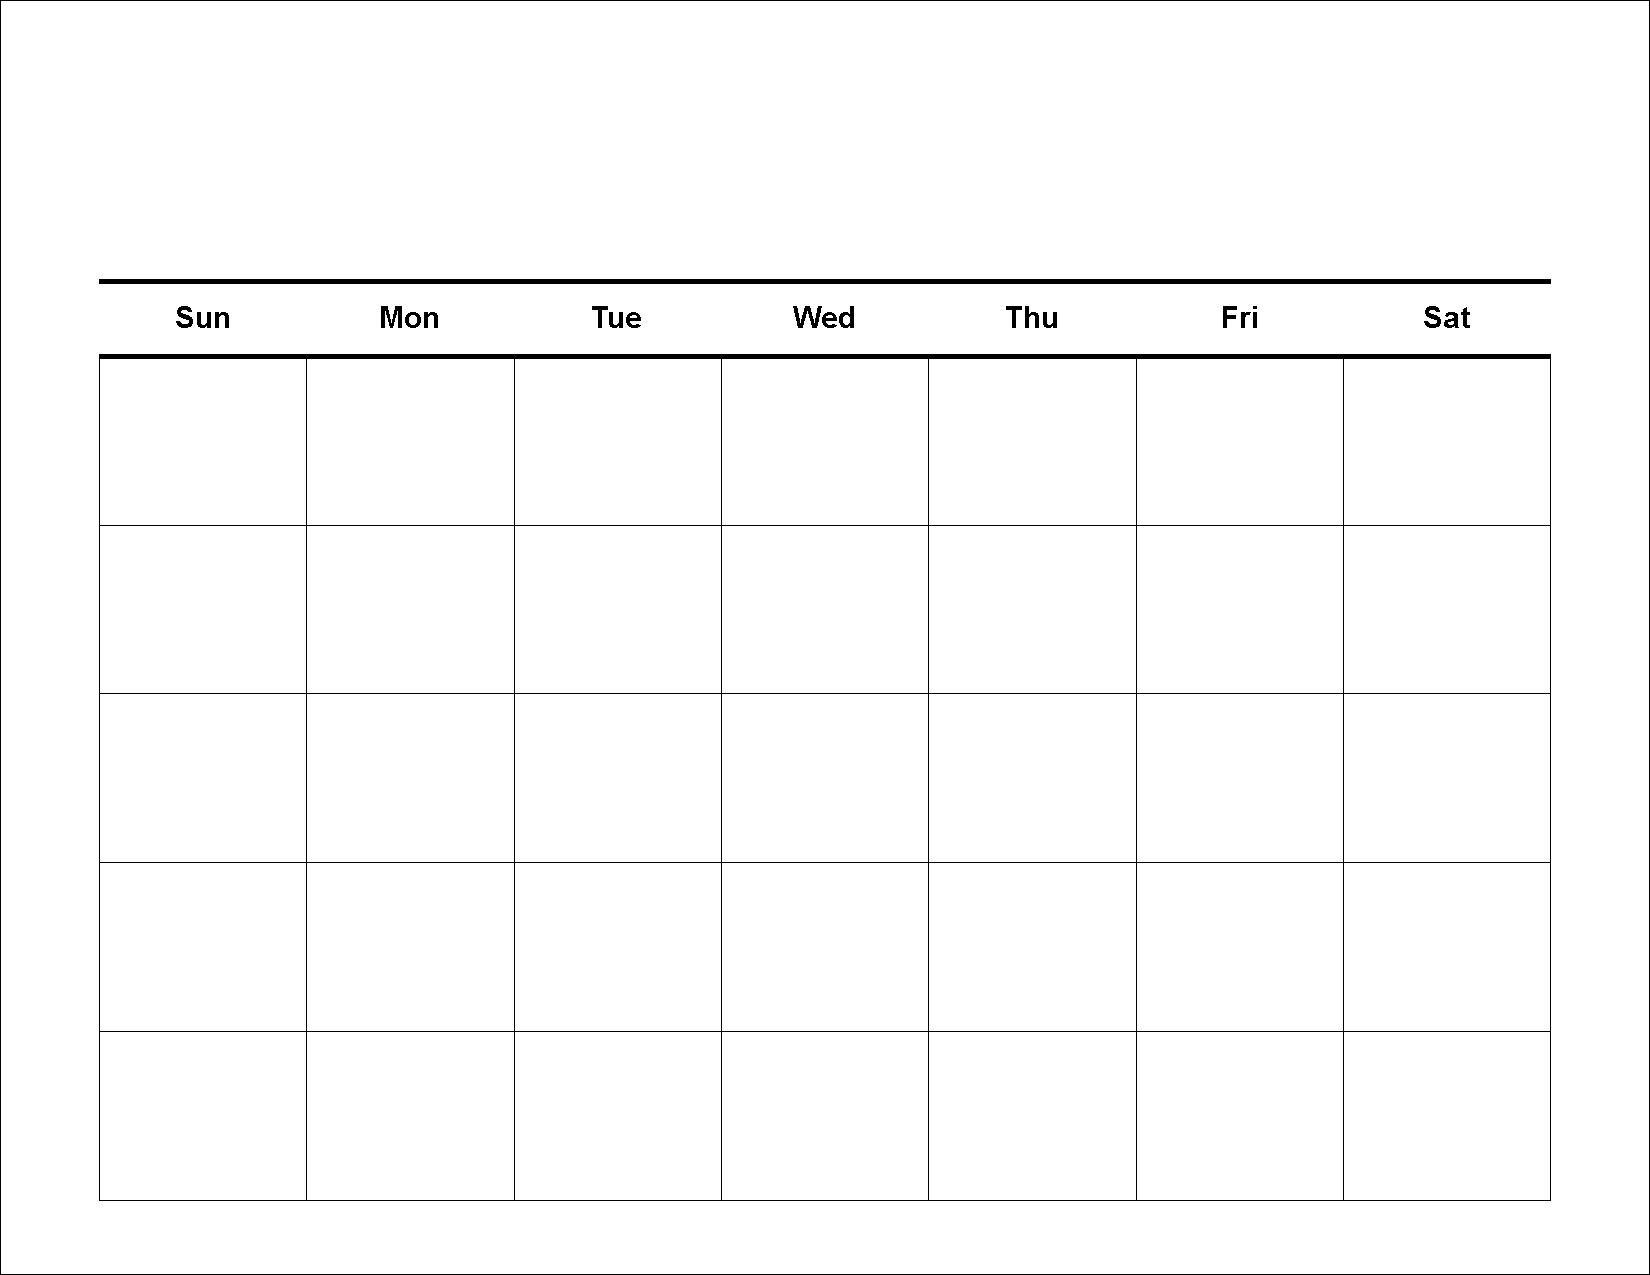 Blank 5 Day Week Calendar   Template Calendar Printable pertaining to 5 Day Week Calendar Printable